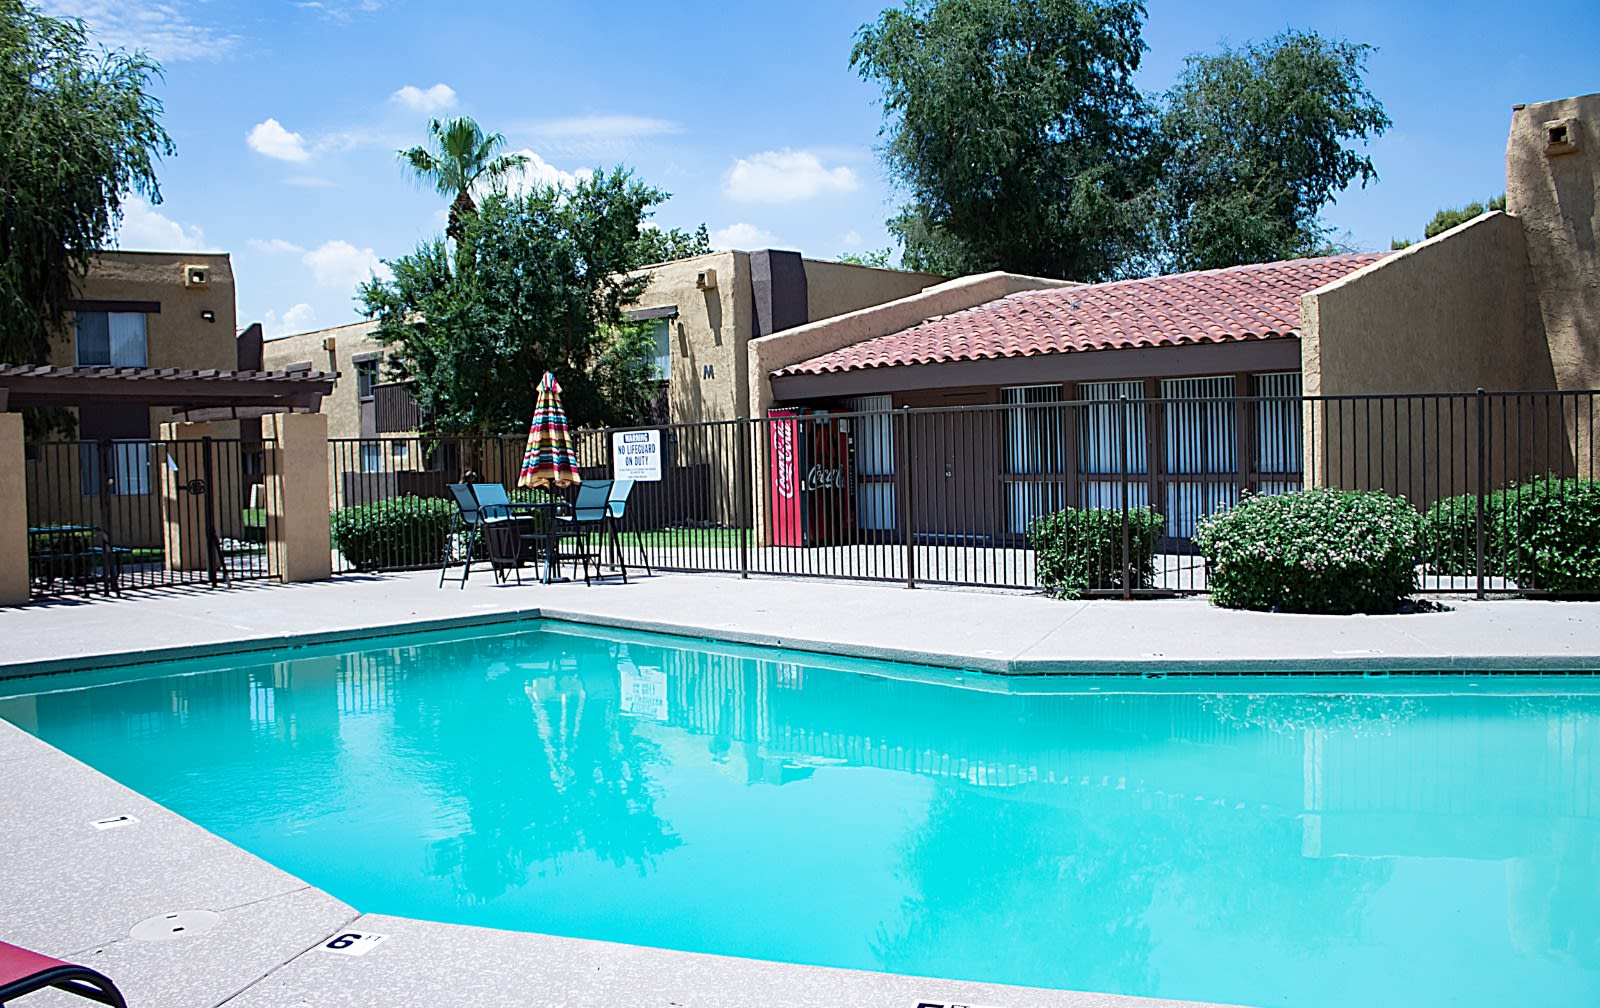 Pool & Pool Patio at Metro Apartments in Phoenix, AZ